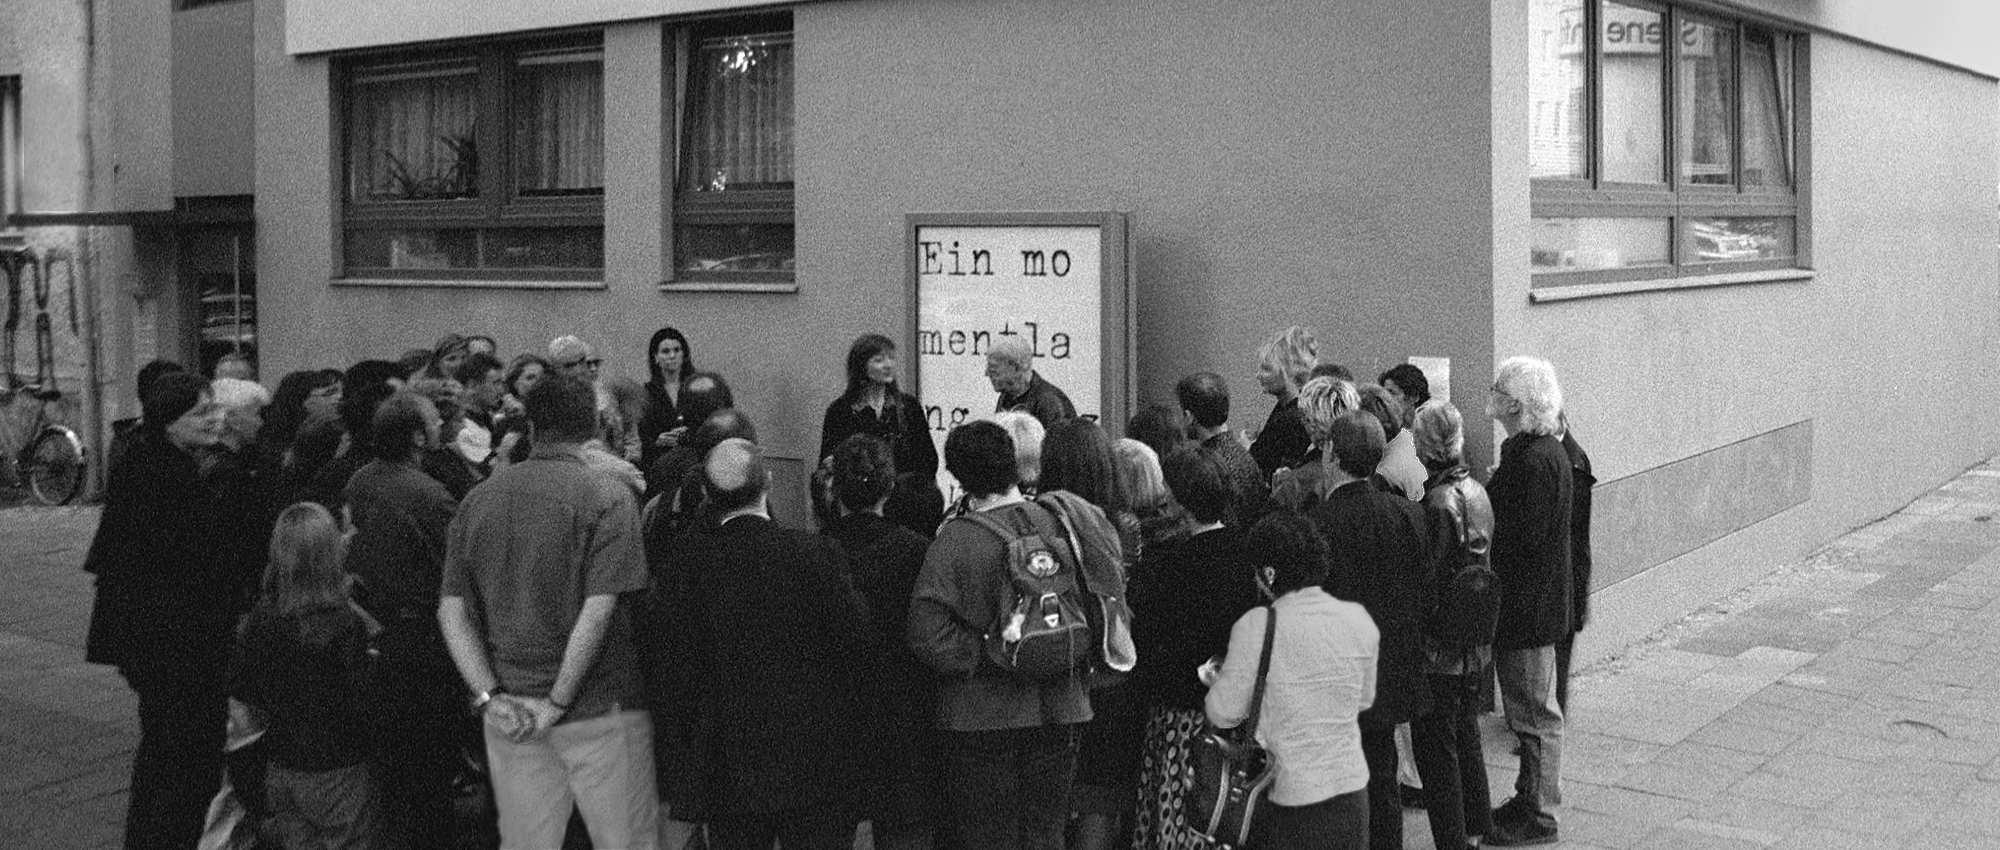 Foto/Graphik Galerie Käthe Kollwitz